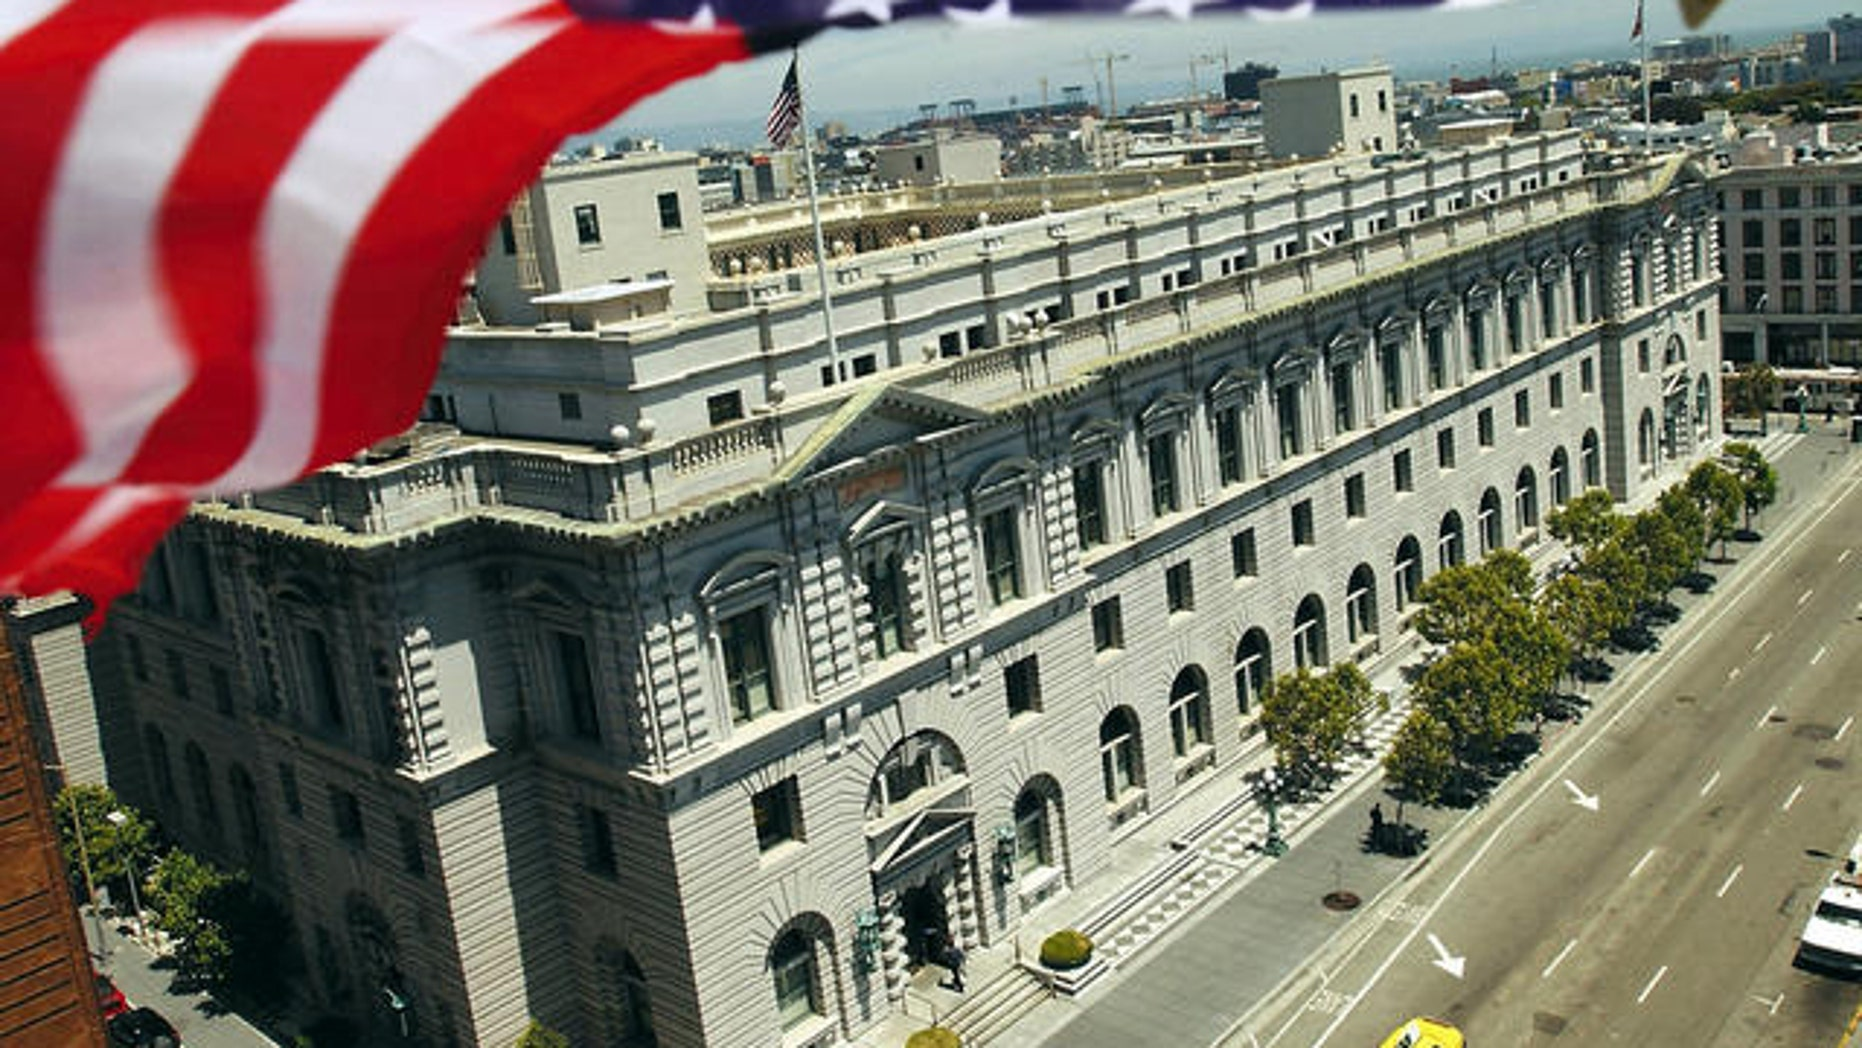 The California Supreme Court building in San Francisco.